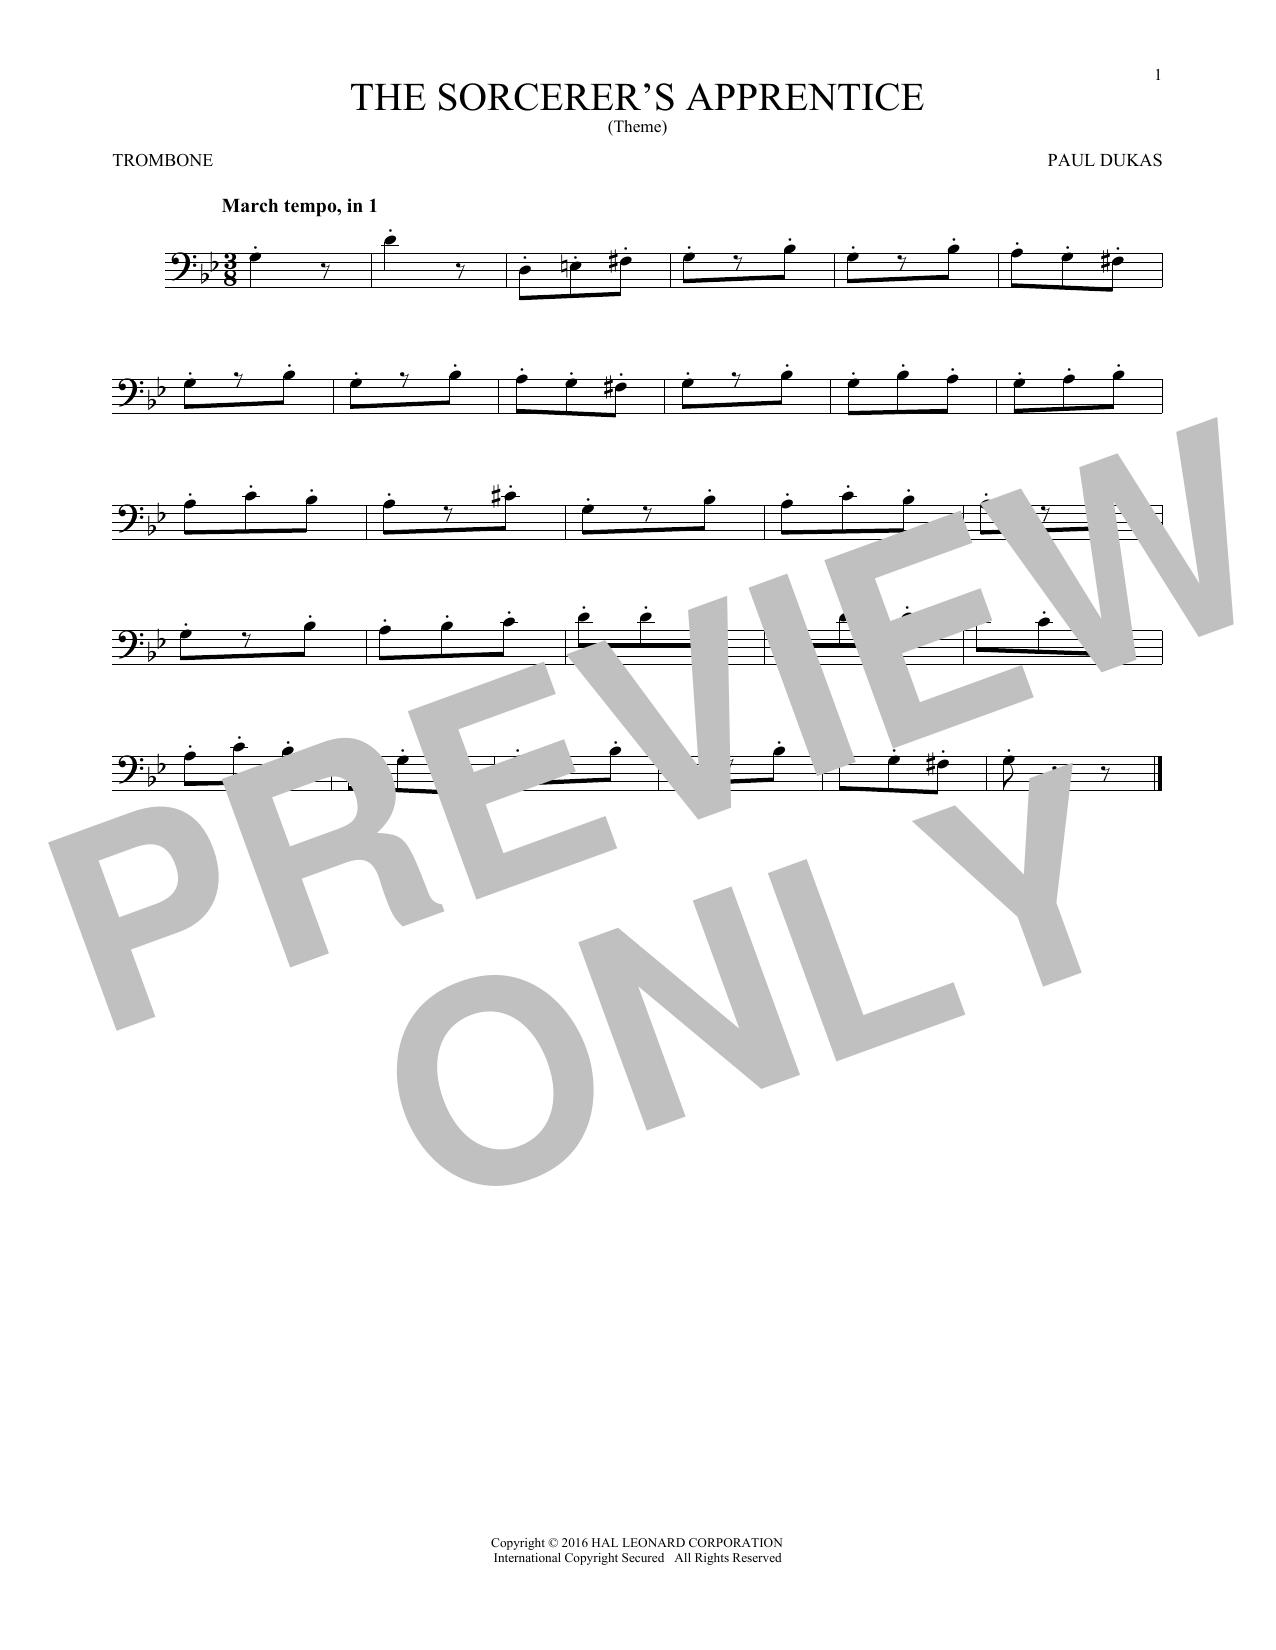 The Sorcerer's Apprentice (Trombone Solo)